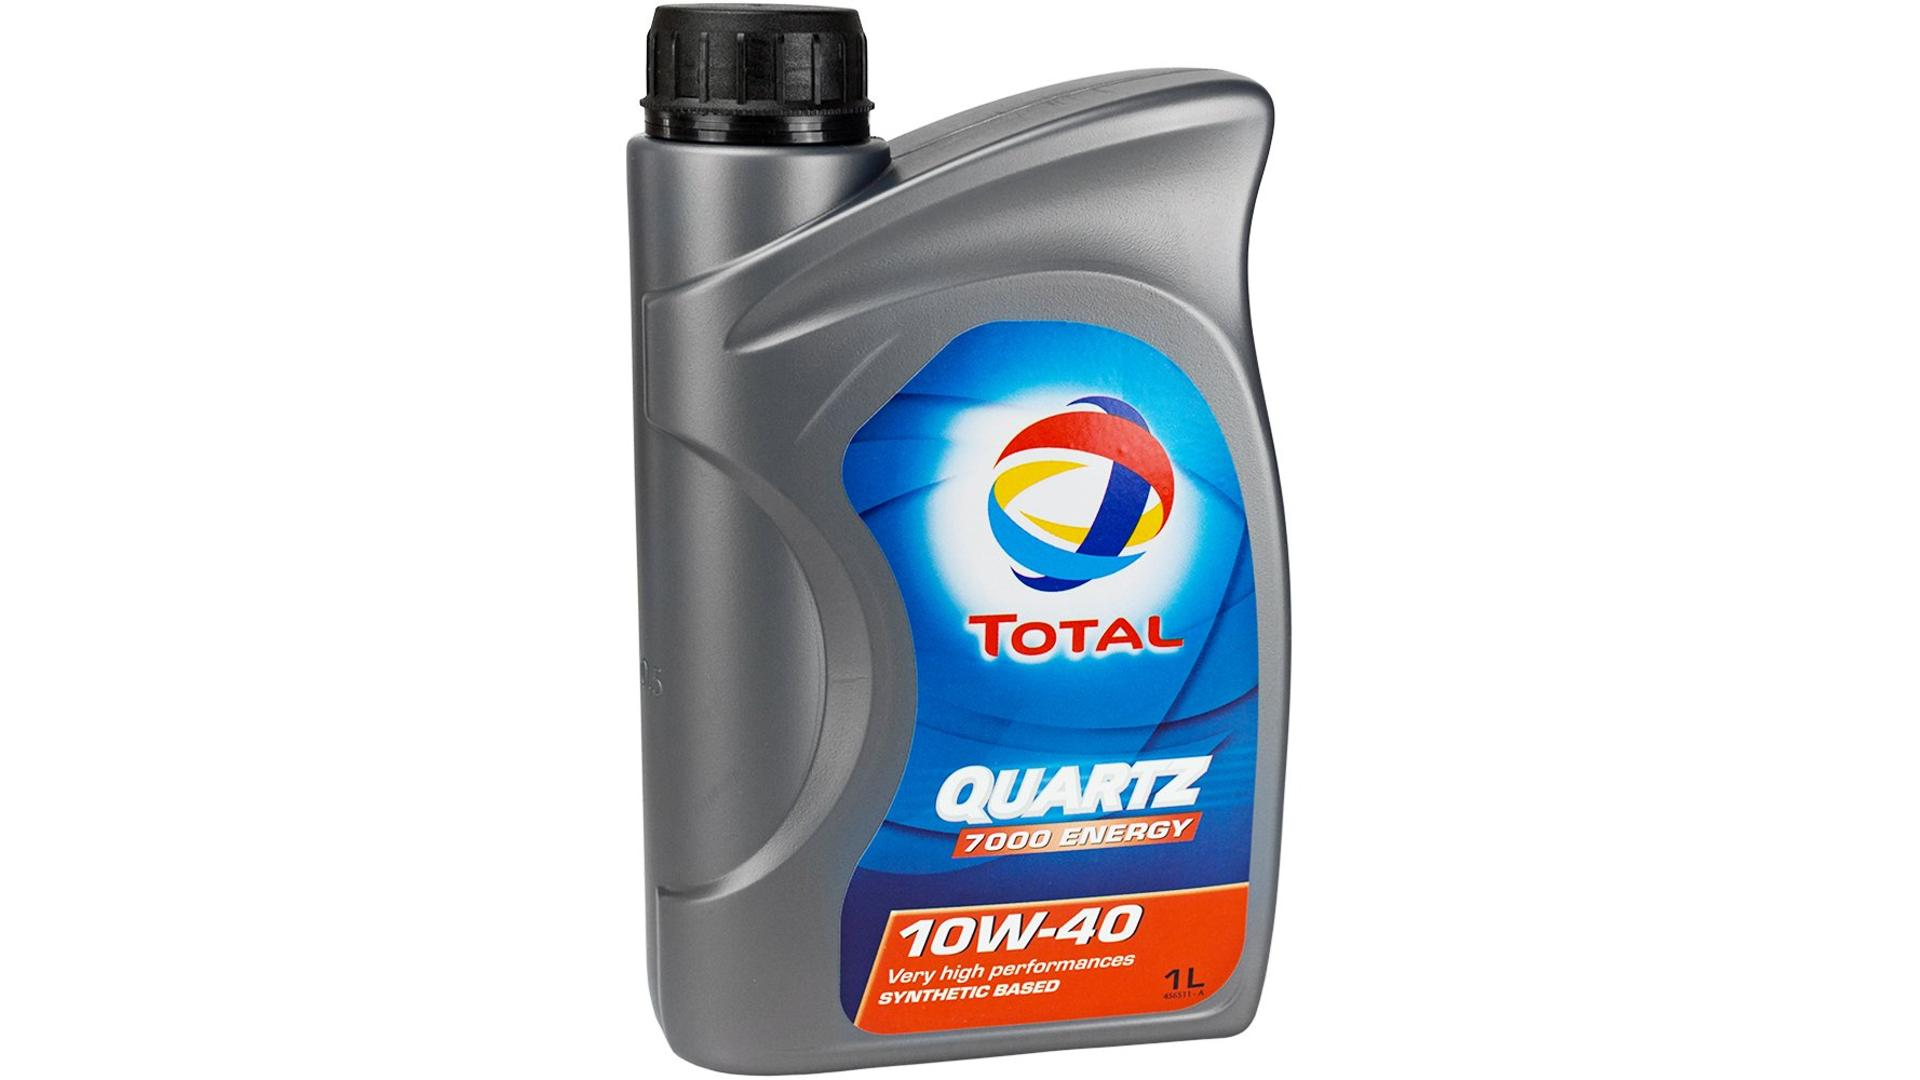 Total 10w-40 Energy 7000 1L (201535)